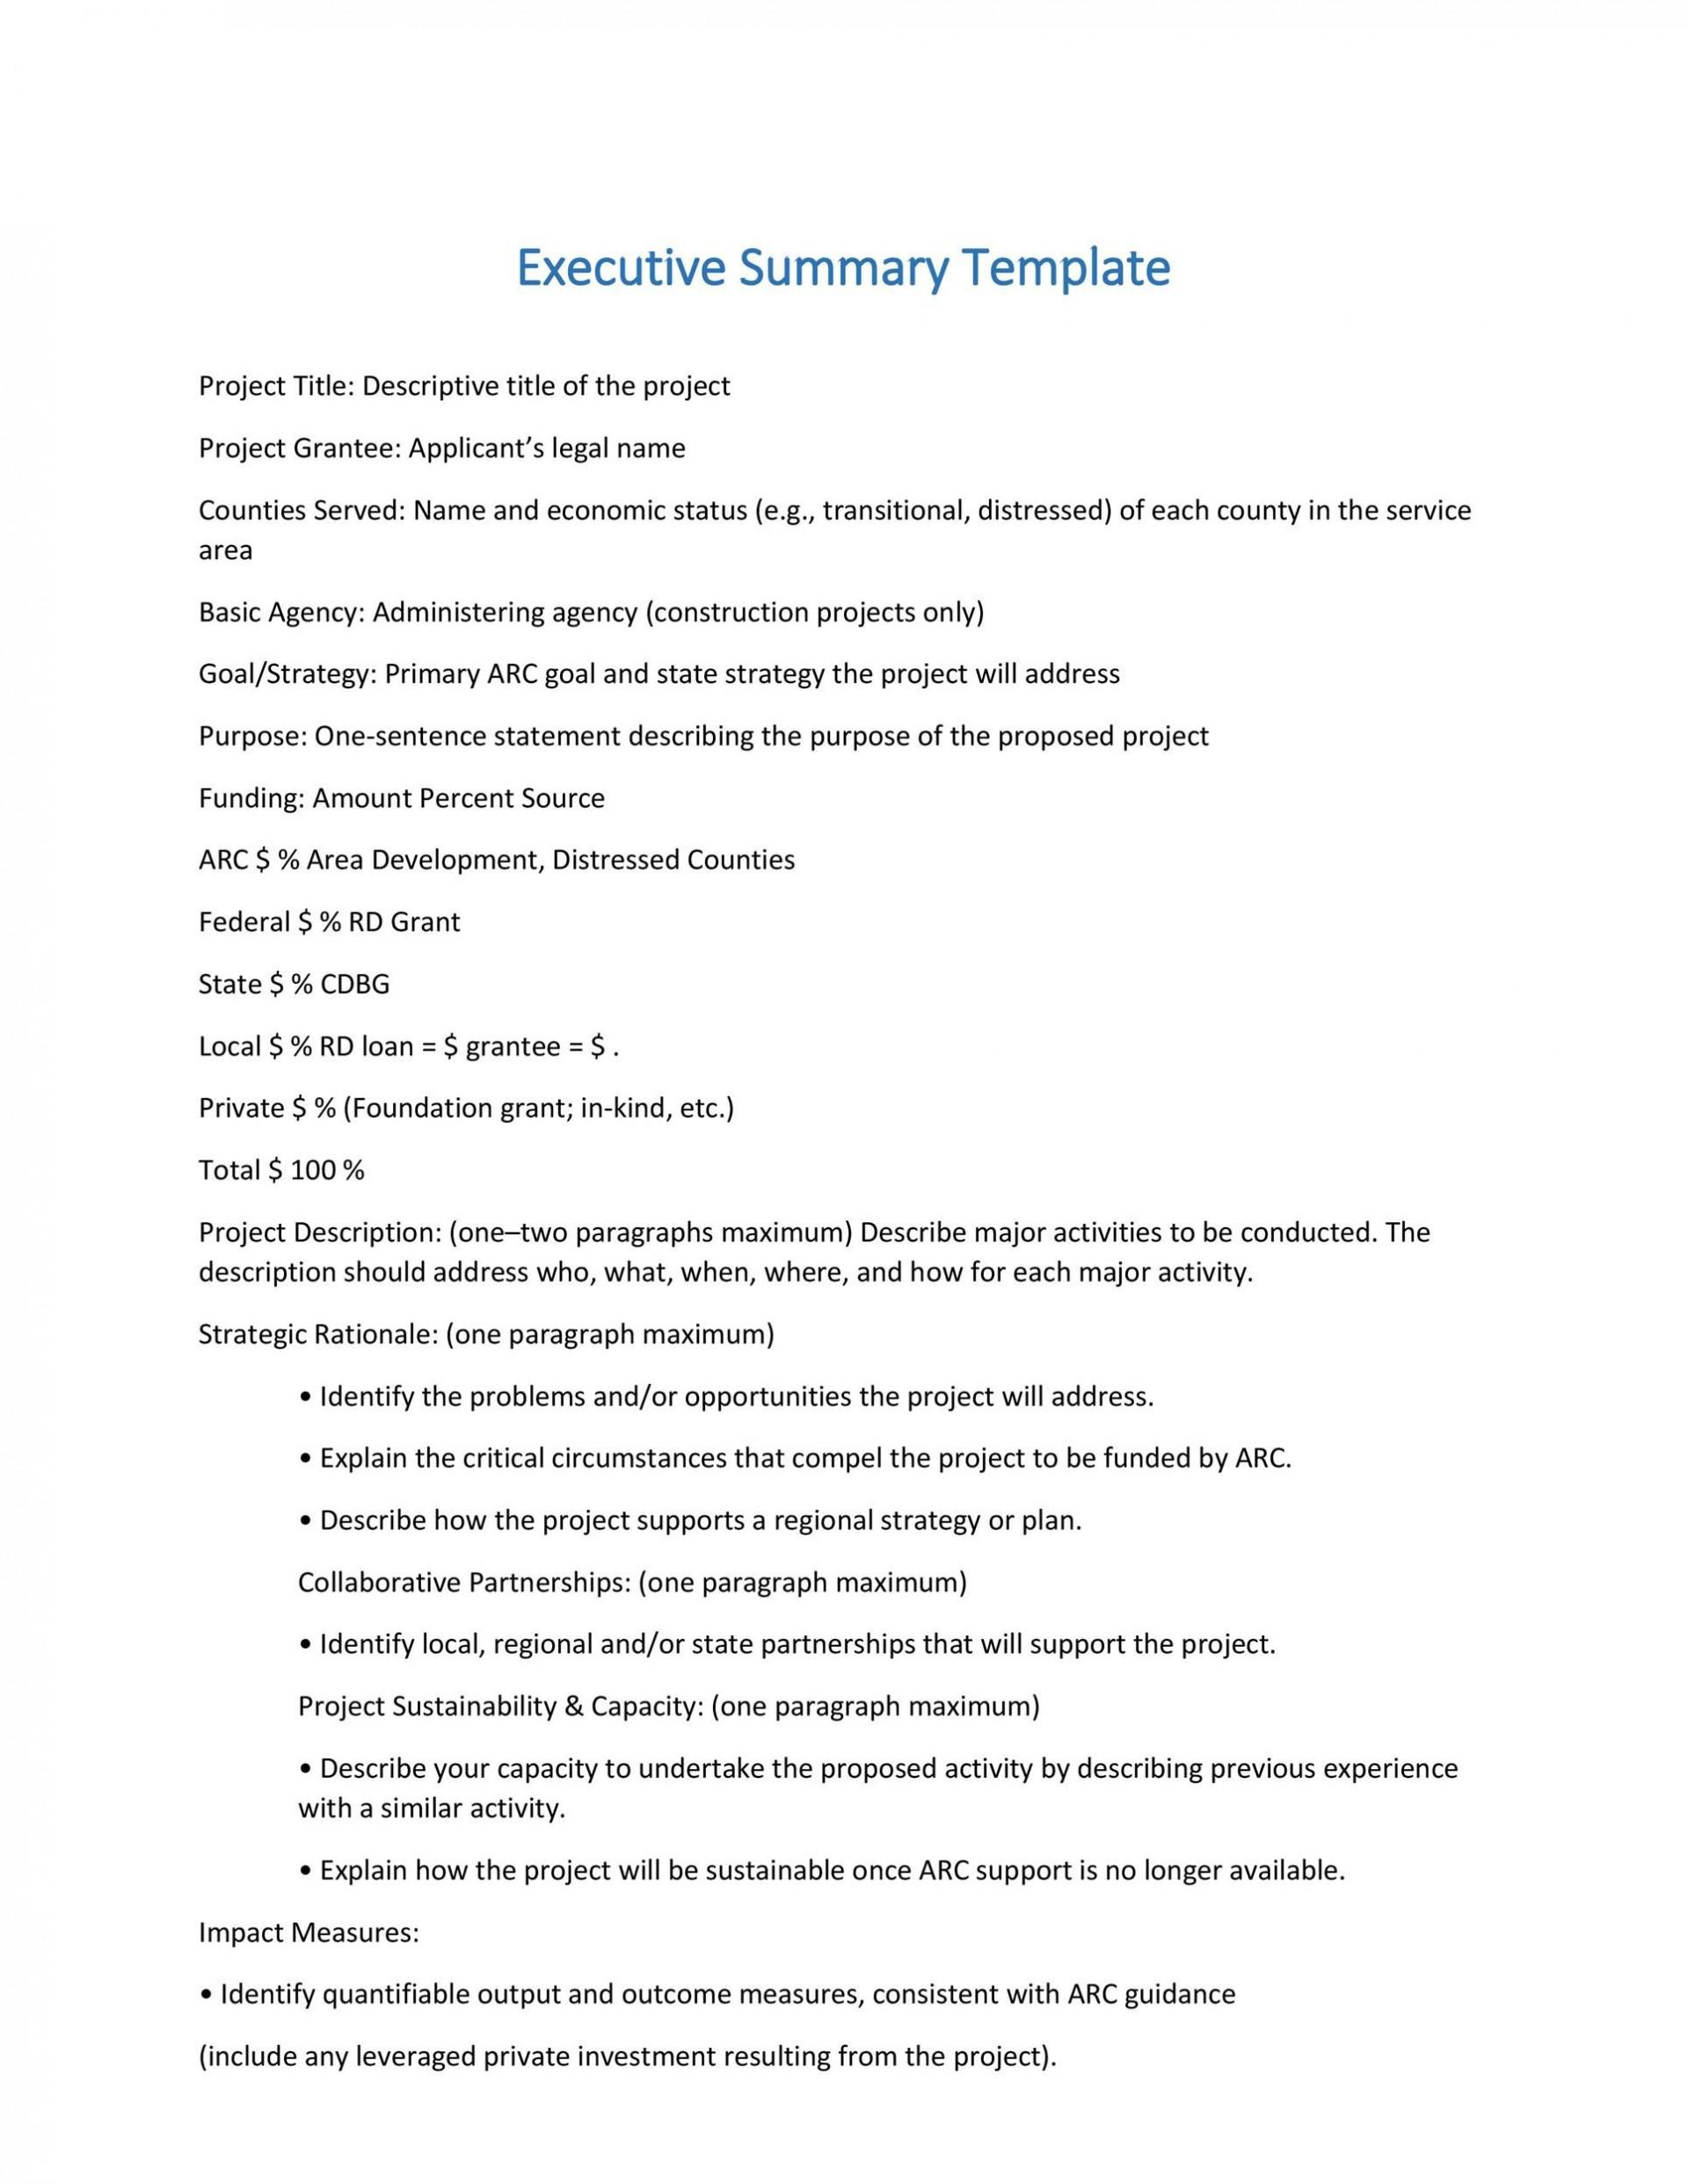 004 Marvelou Executive Summary Template Doc Highest Clarity  Document Example Google1920